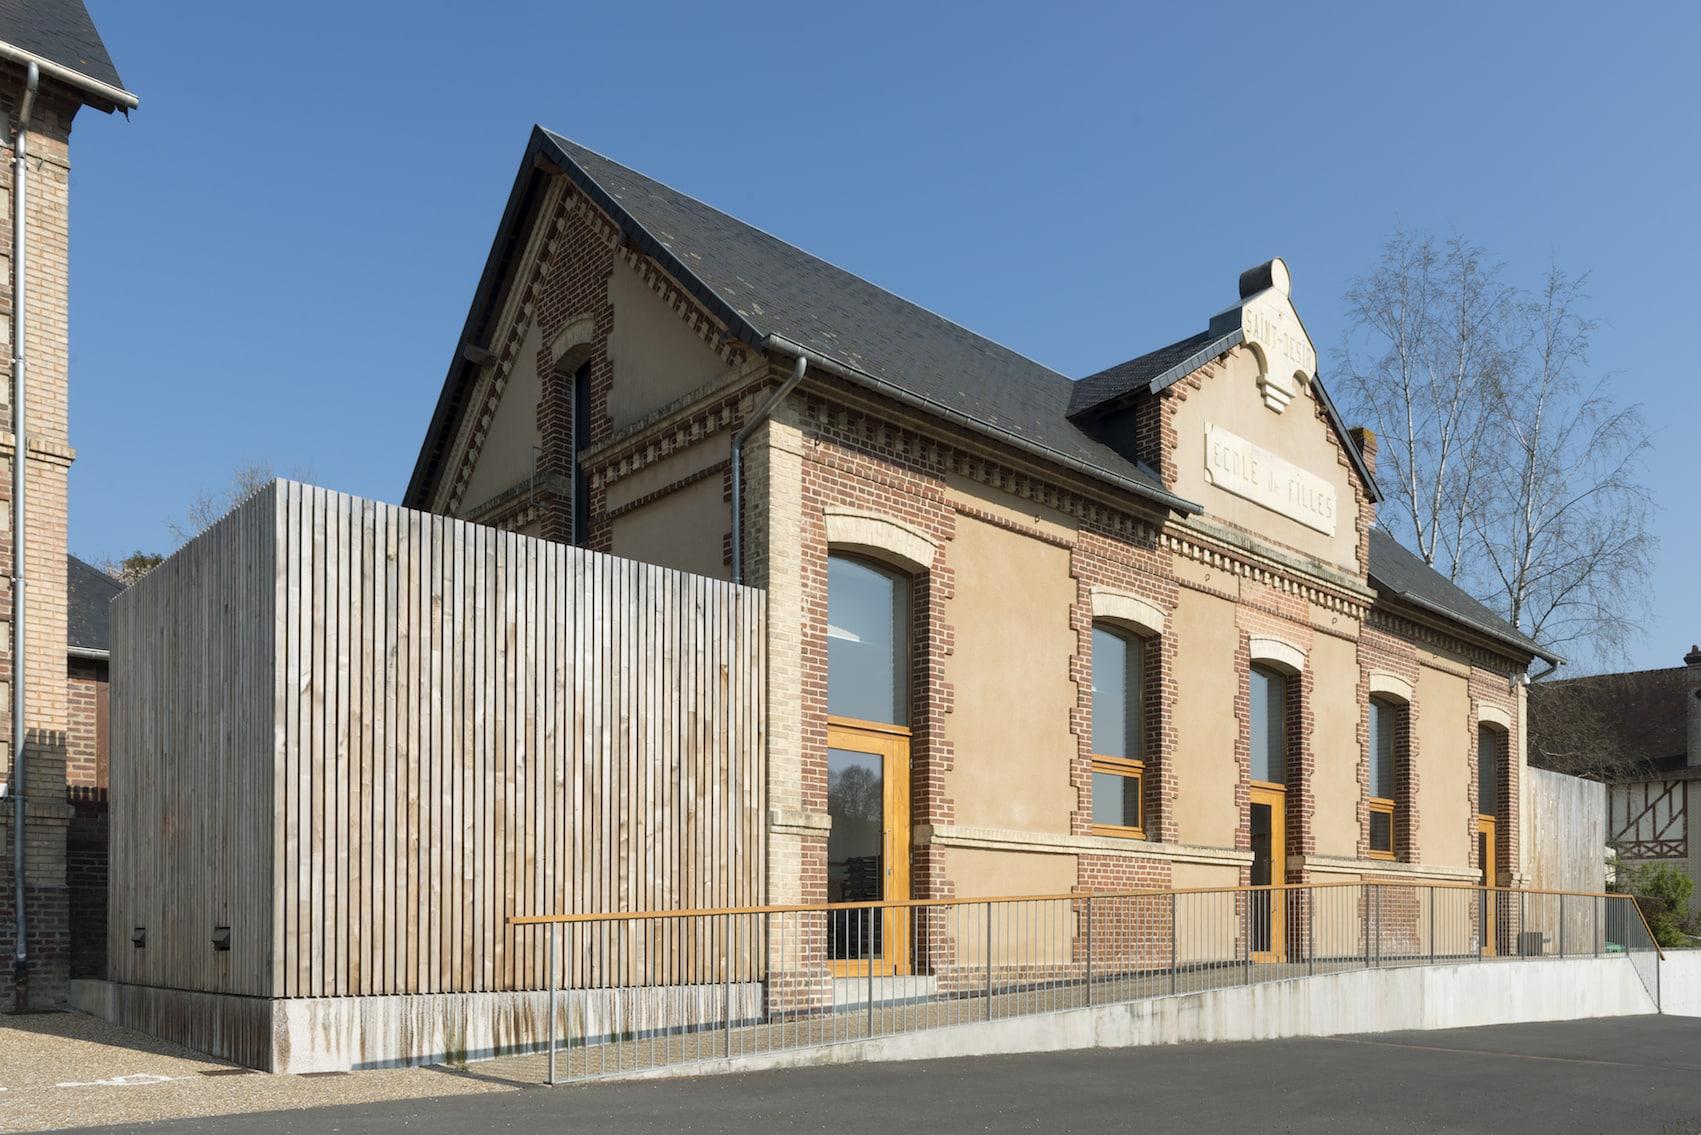 Saint Desir 2 05 - Salle communale – Saint Désir